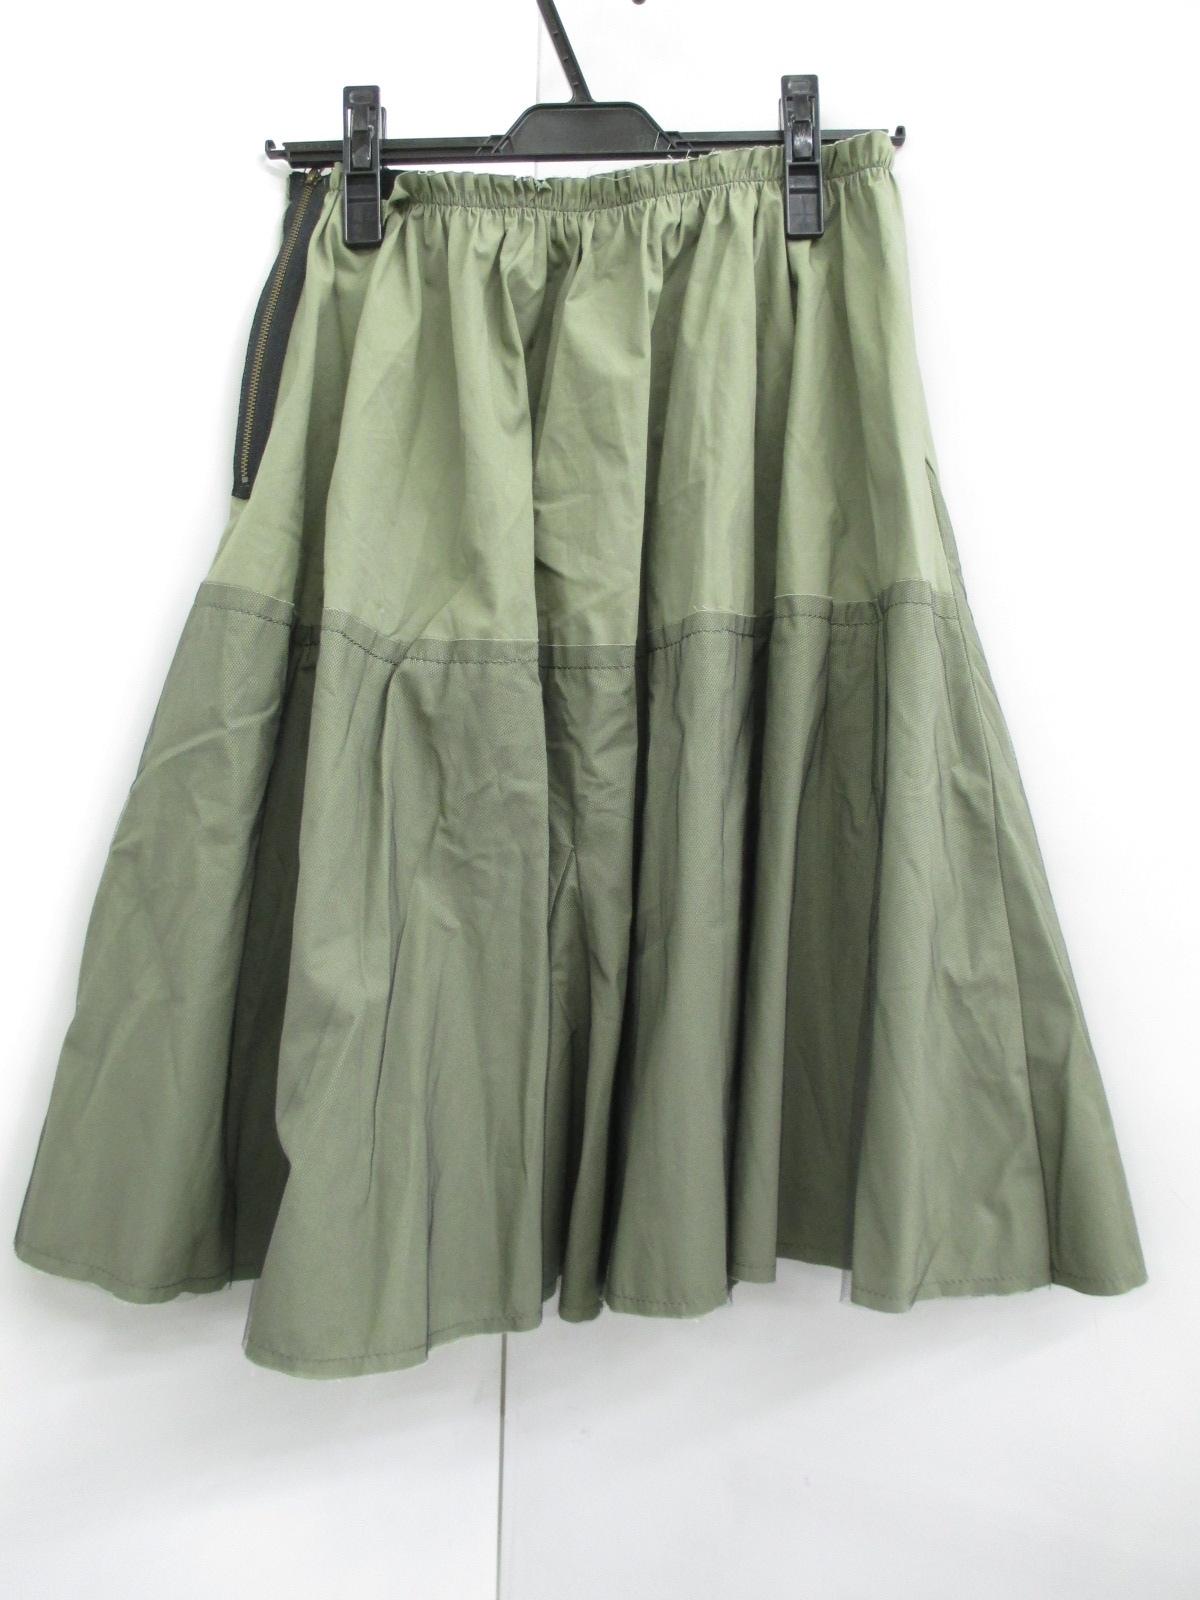 C.PILI(ピリ)のスカート